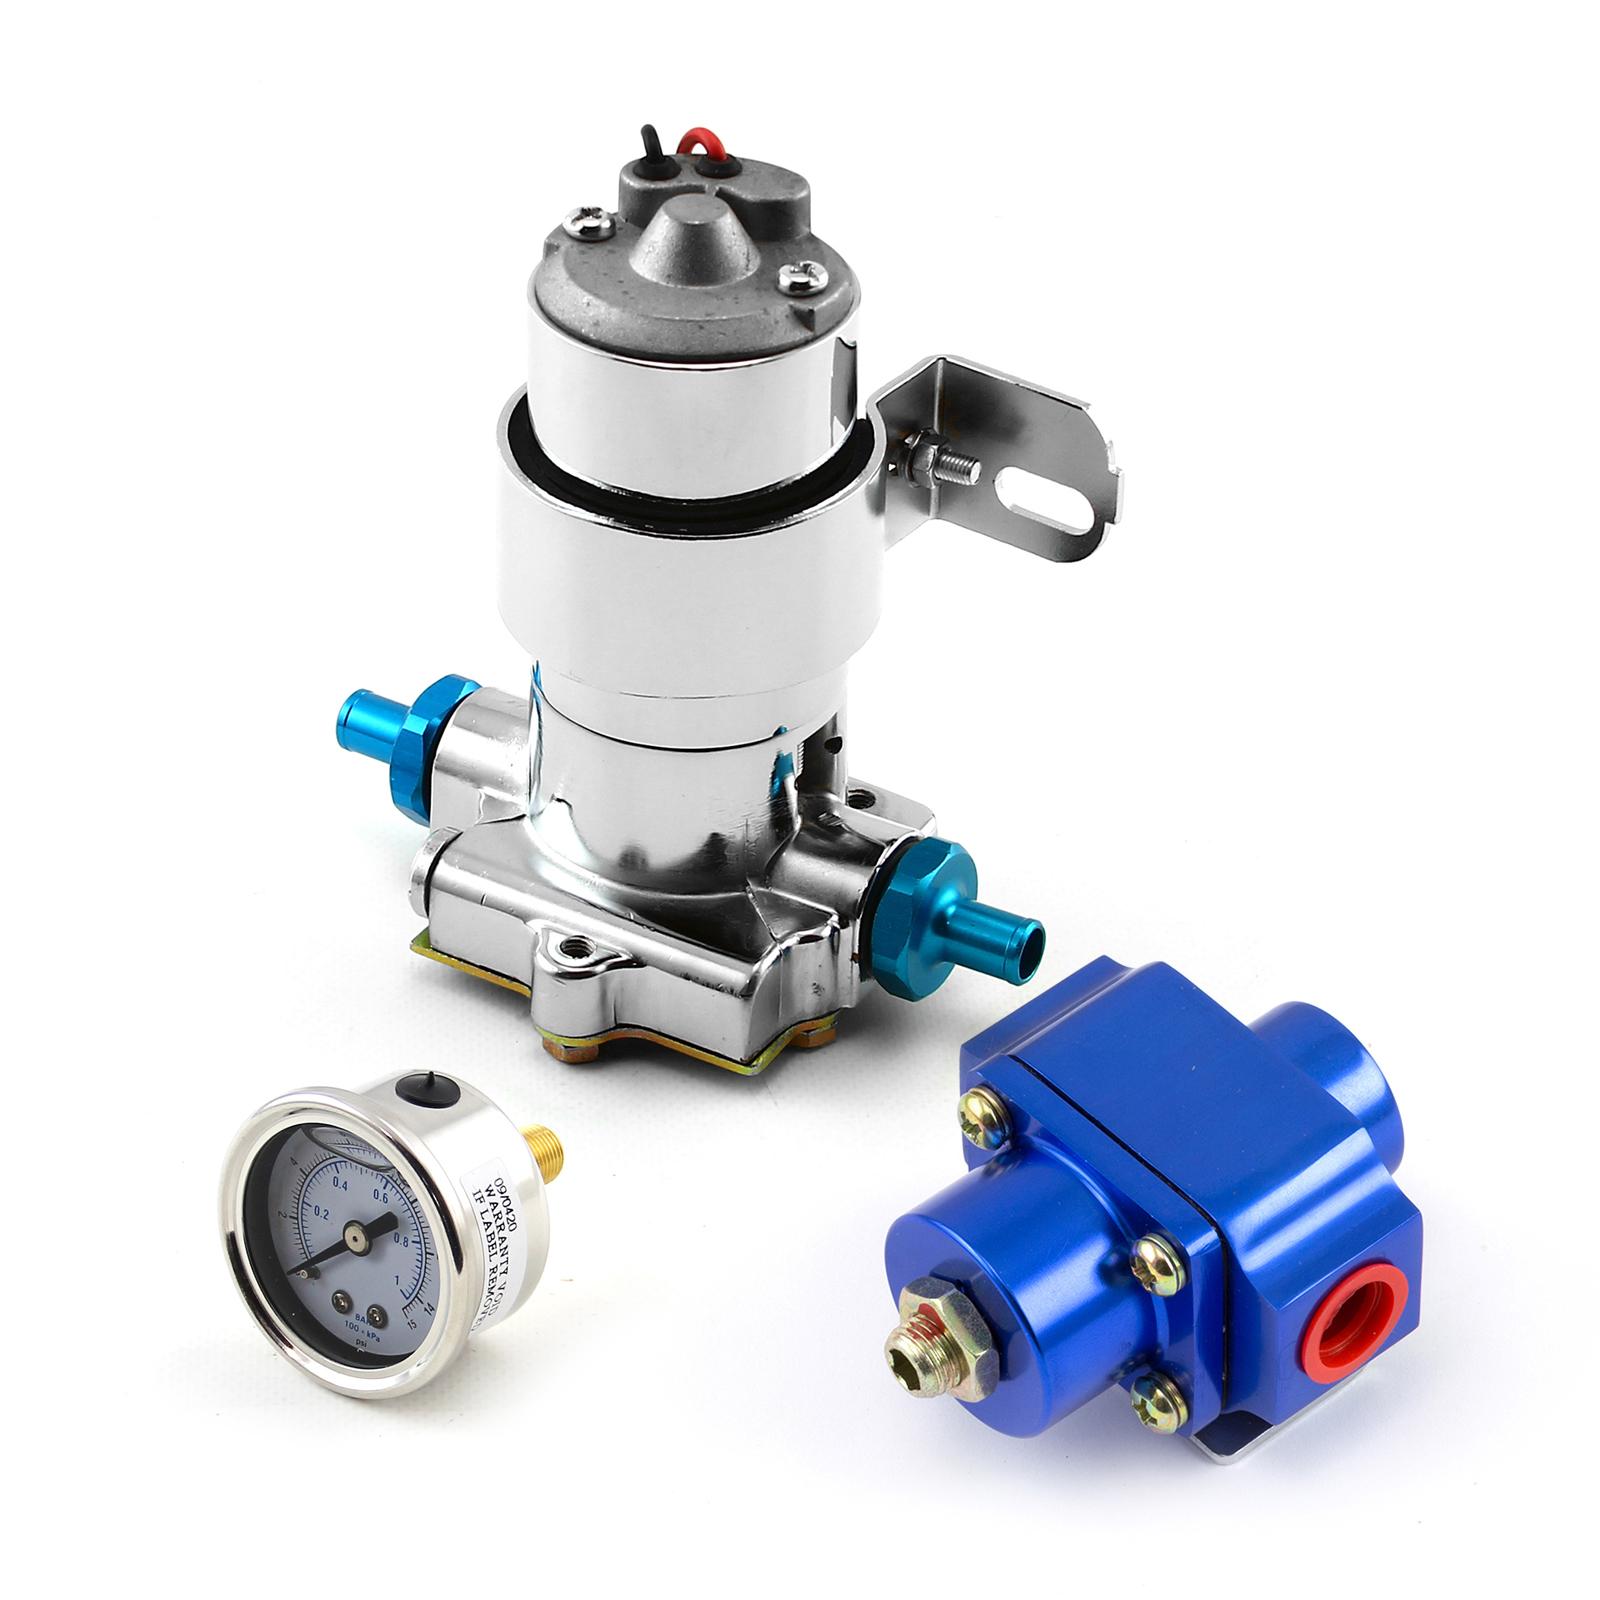 140 Gph Universal Chrome Electric Fuel Pump Blue Regulator & Gauge Combo Kit